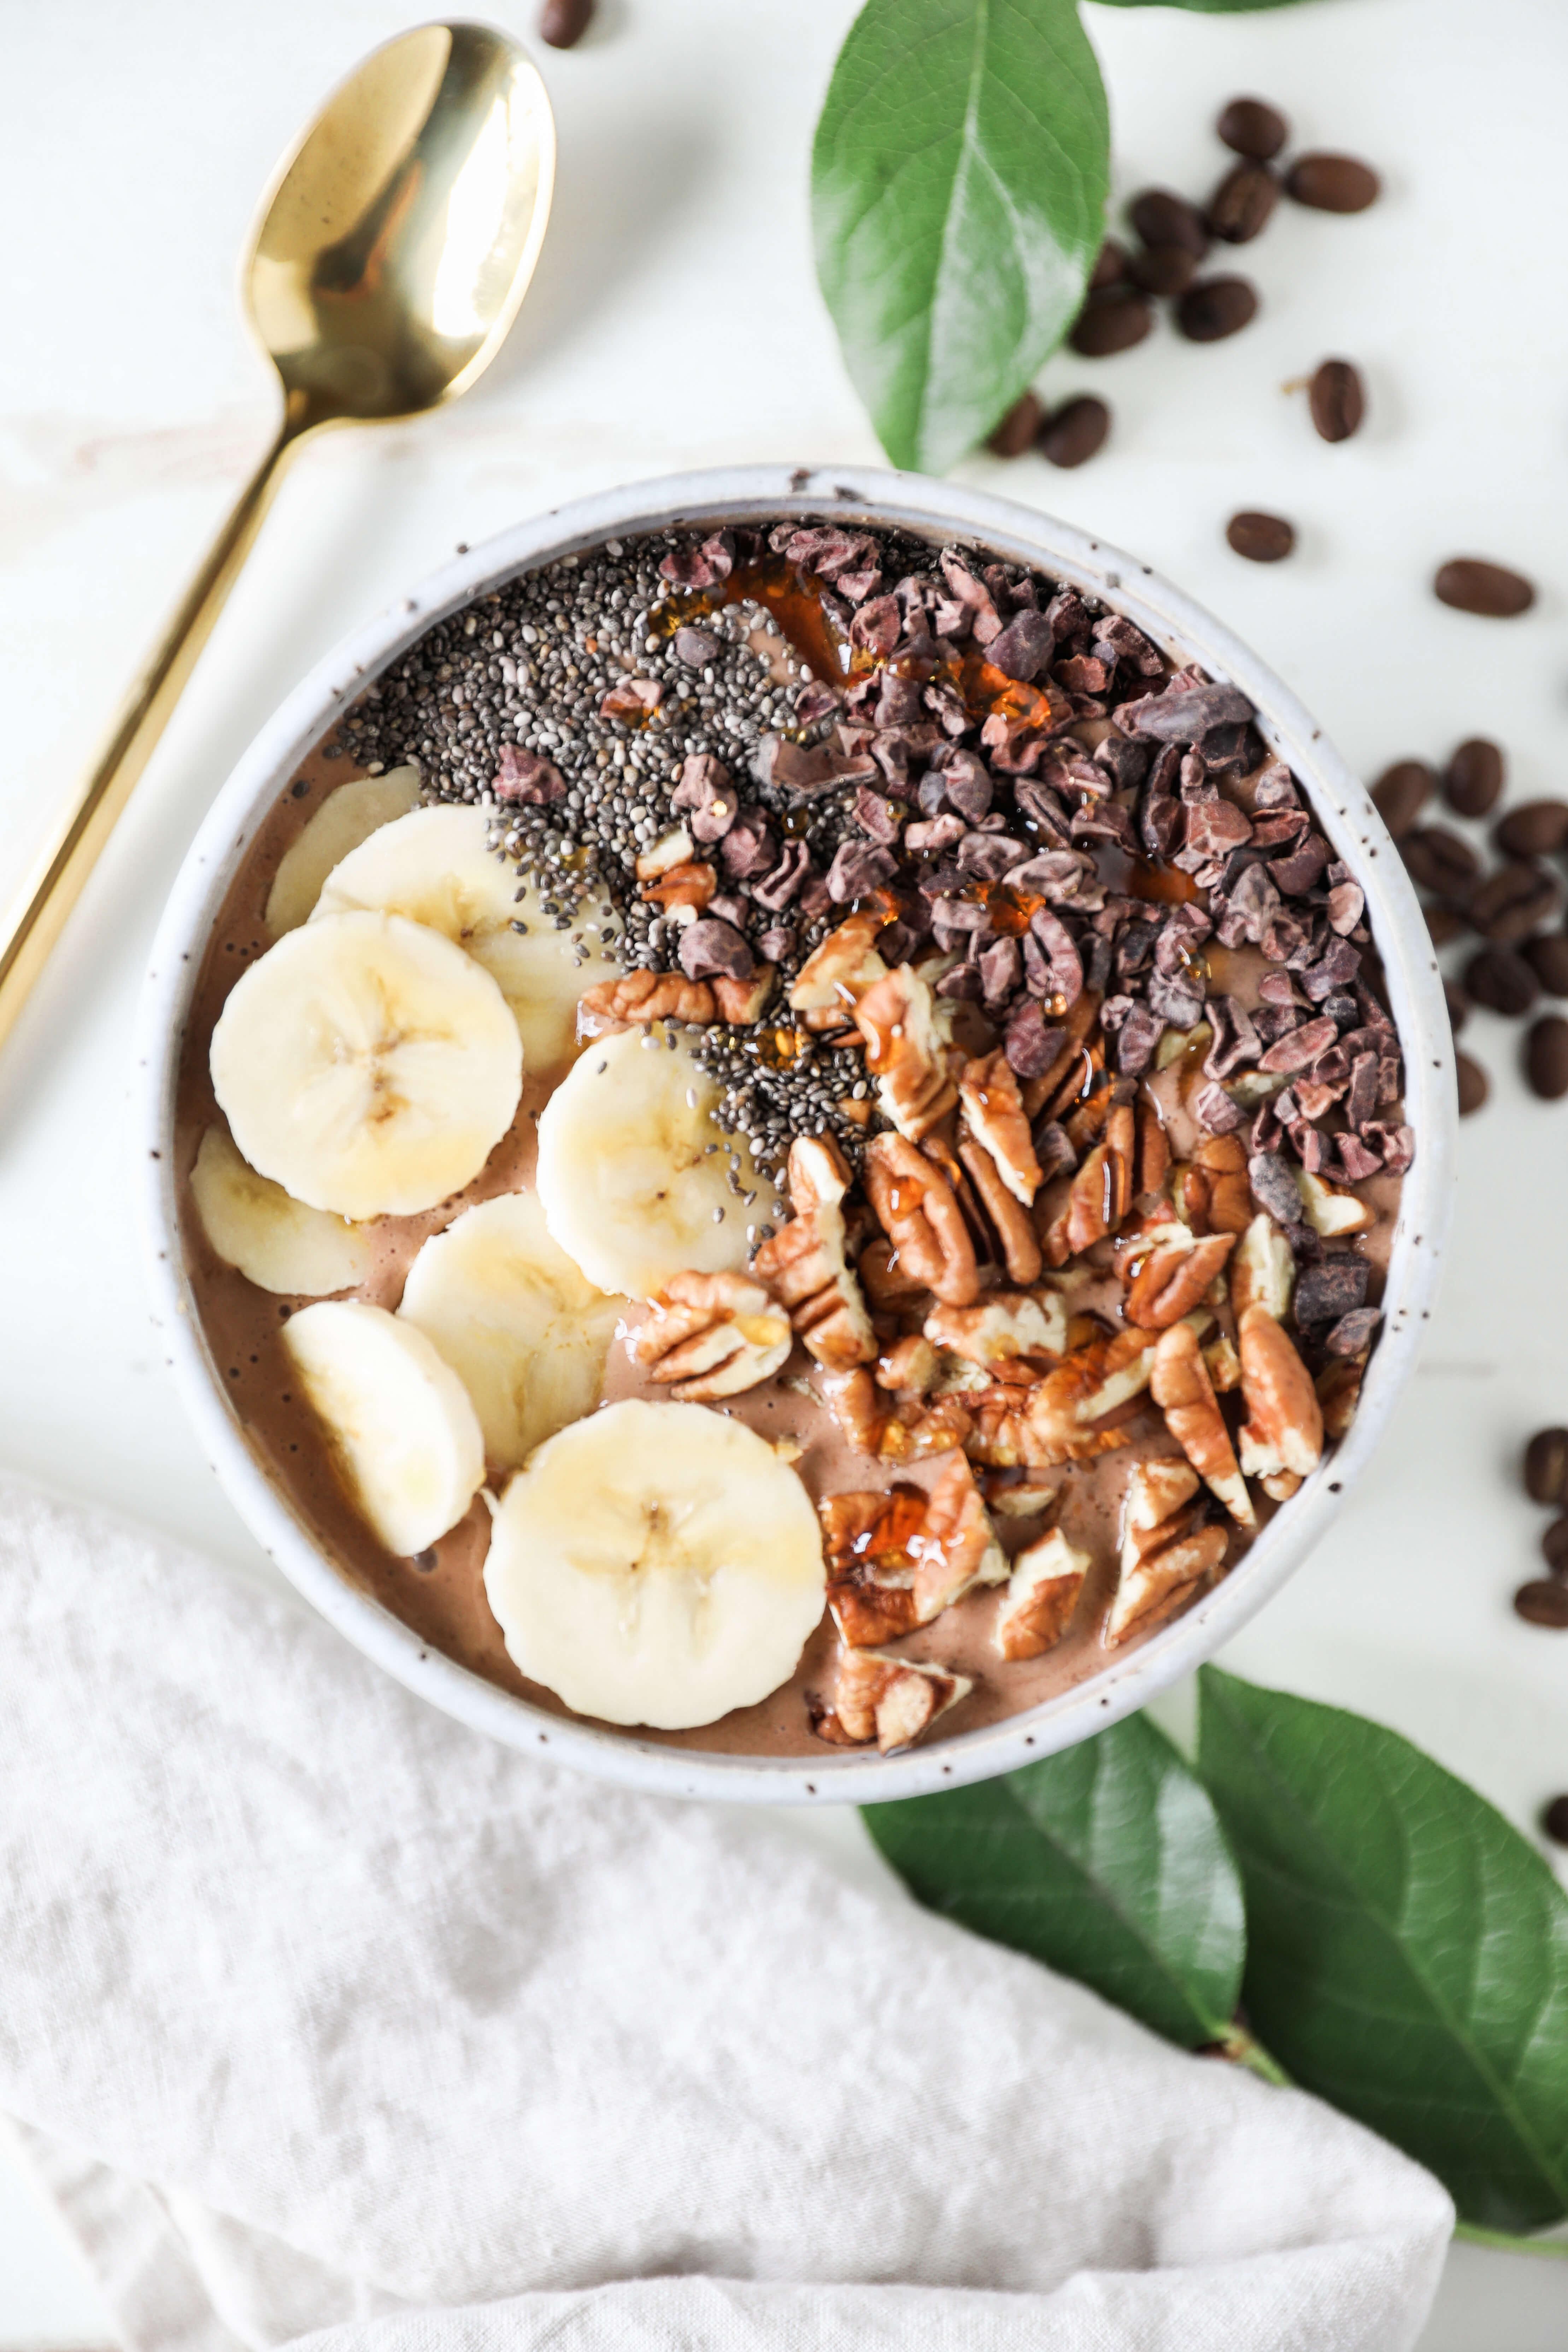 Peanut Butter Banana Mocha Smoothie Bowl Jessi S Kitchen